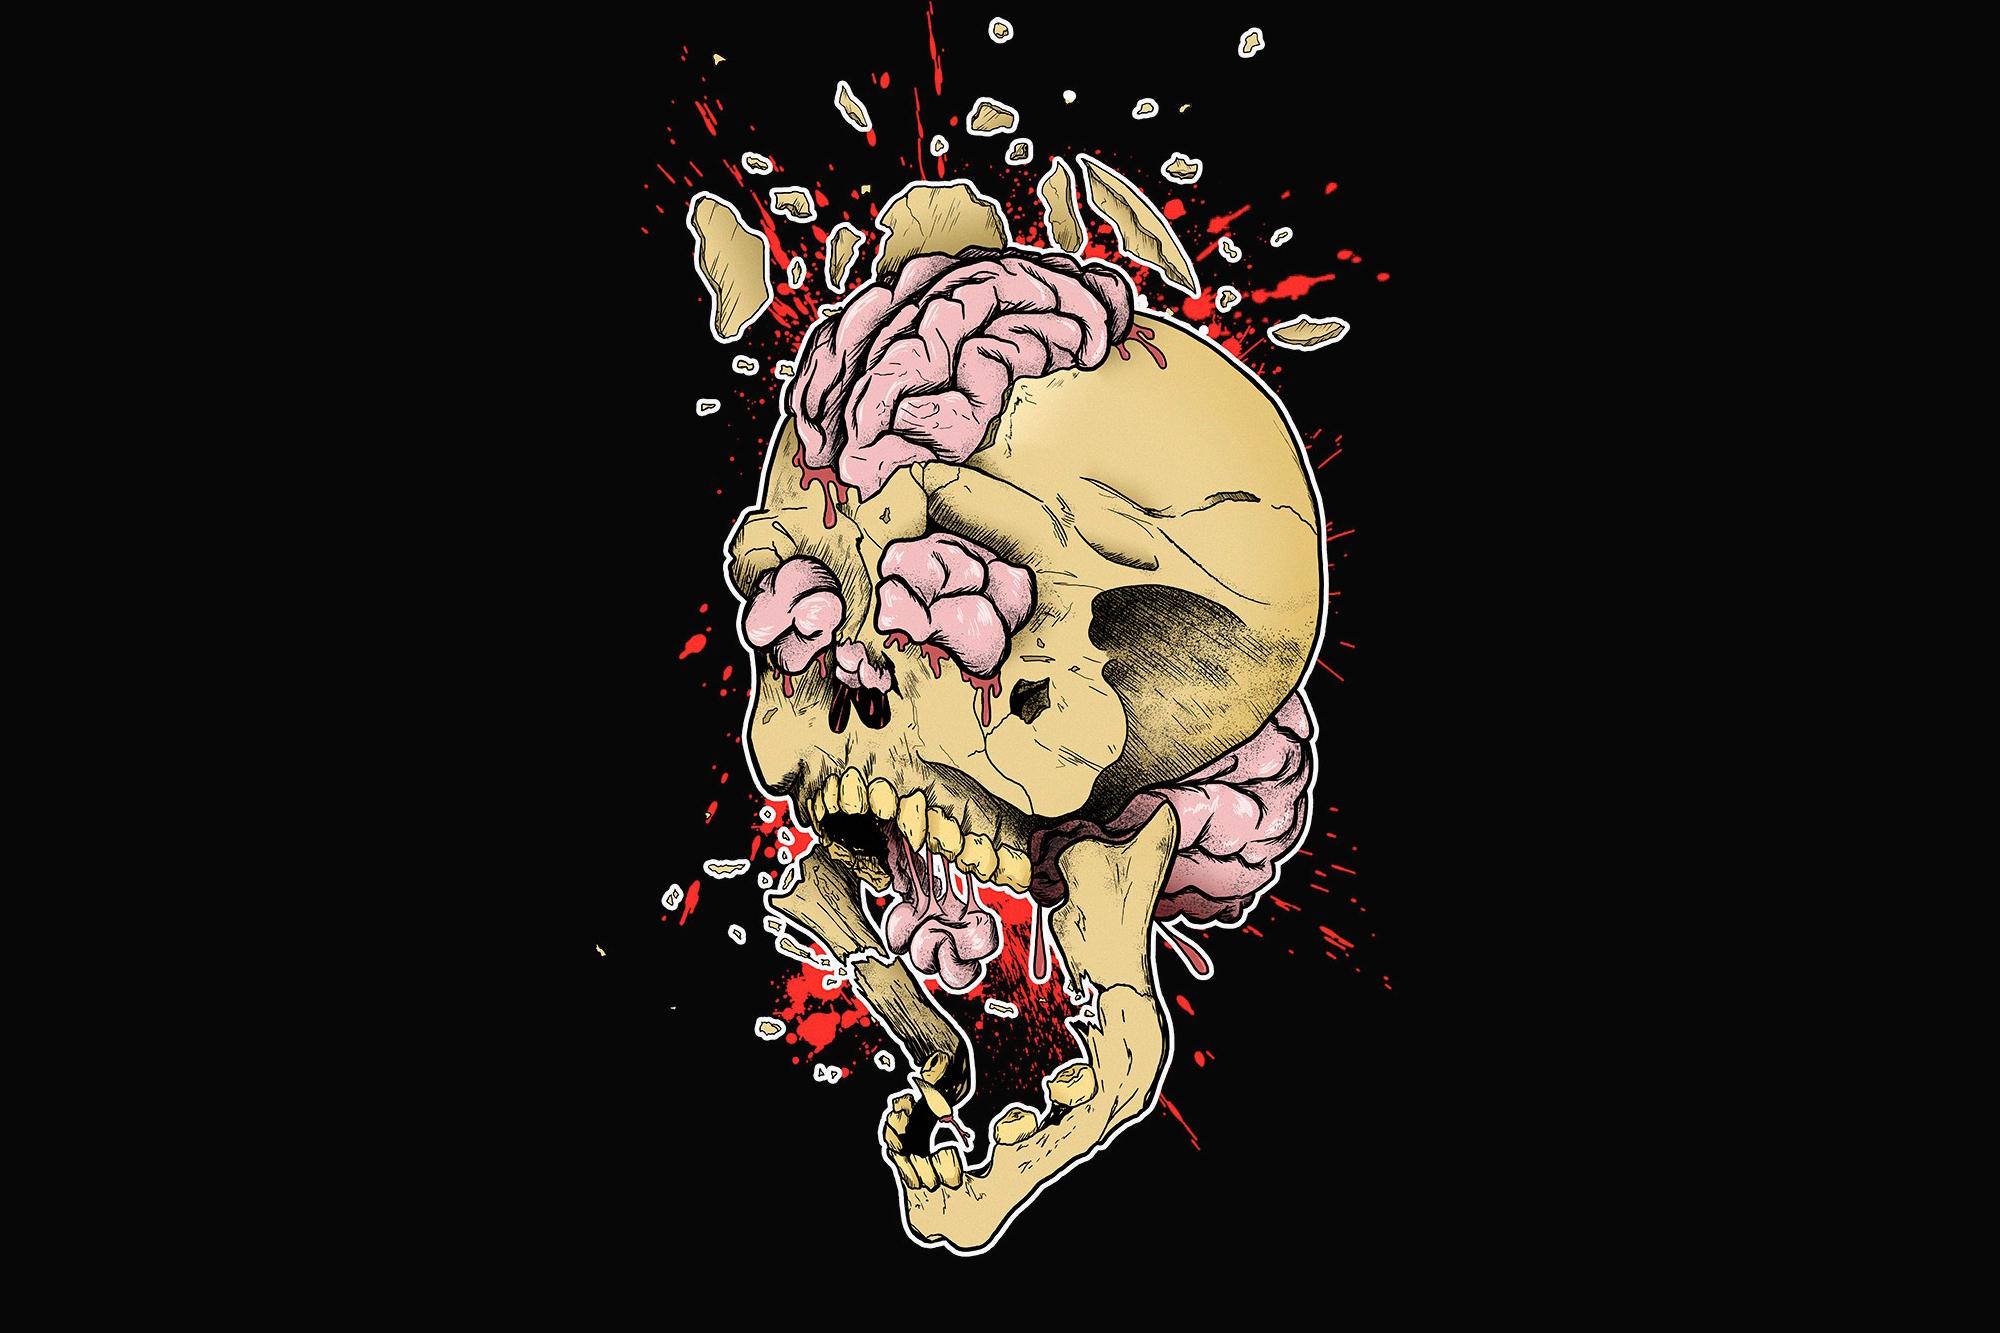 Drawn brains skull Images brain wallpapers teeth Skull